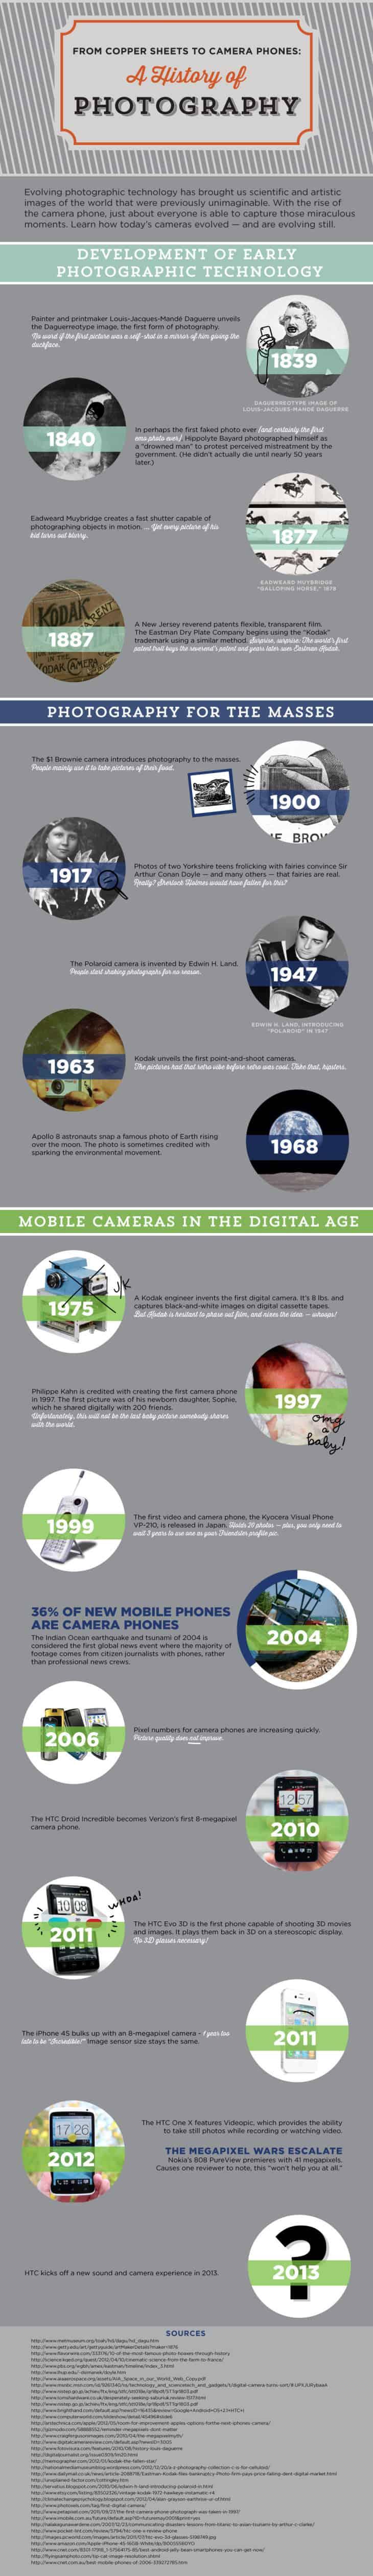 fotografi-infographic